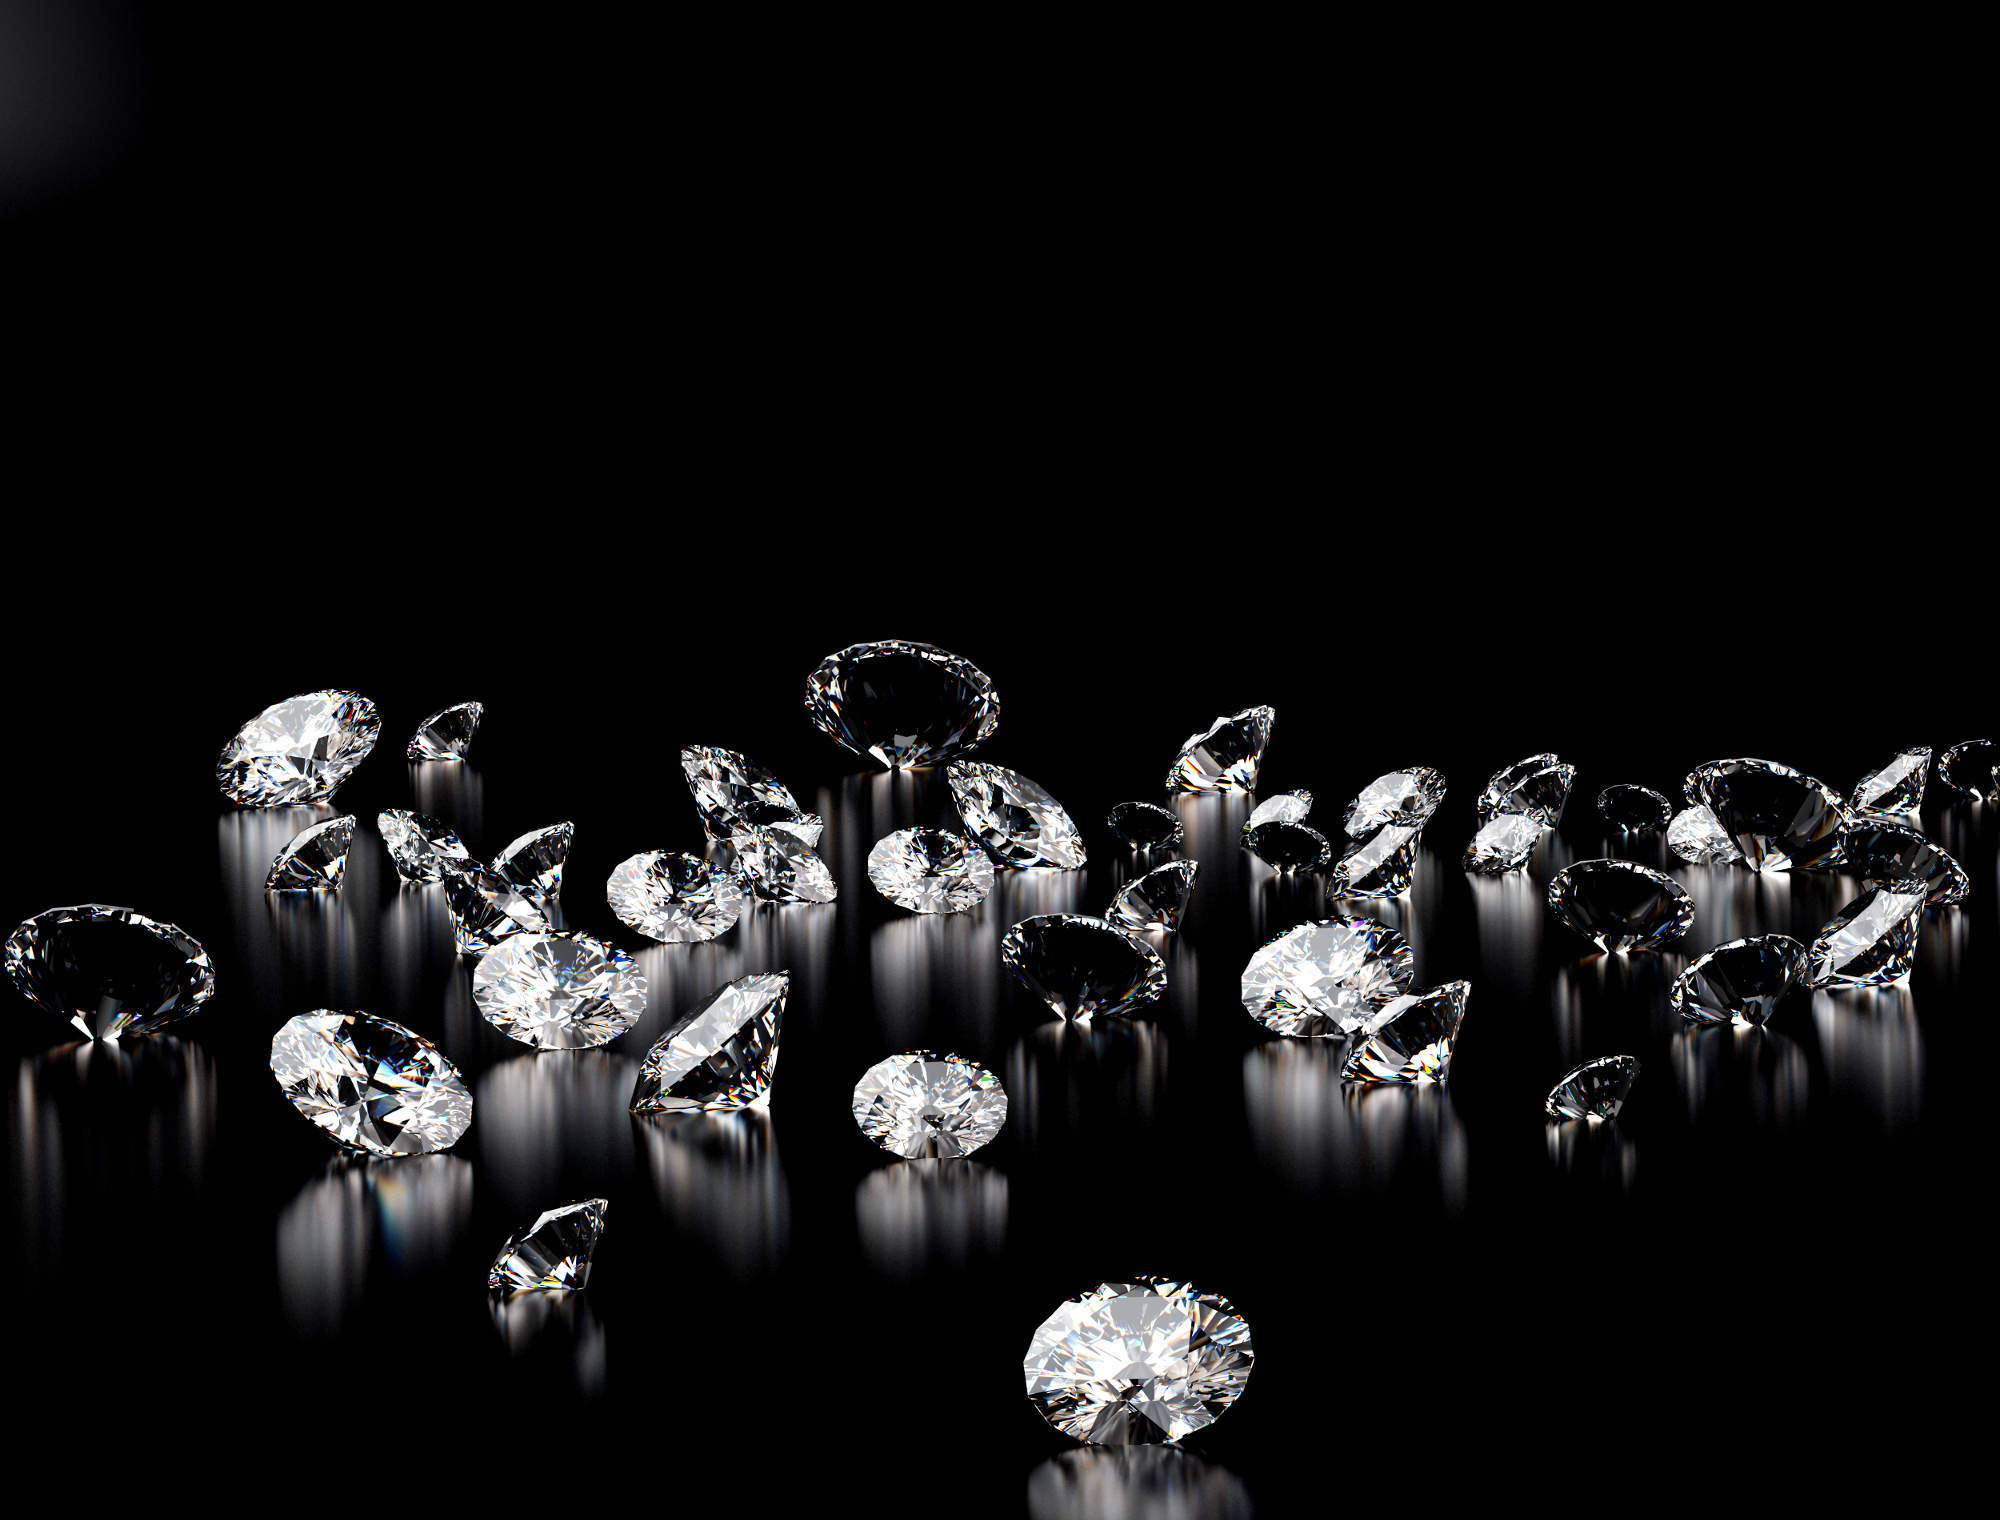 China and India will match US diamond demand by 2020